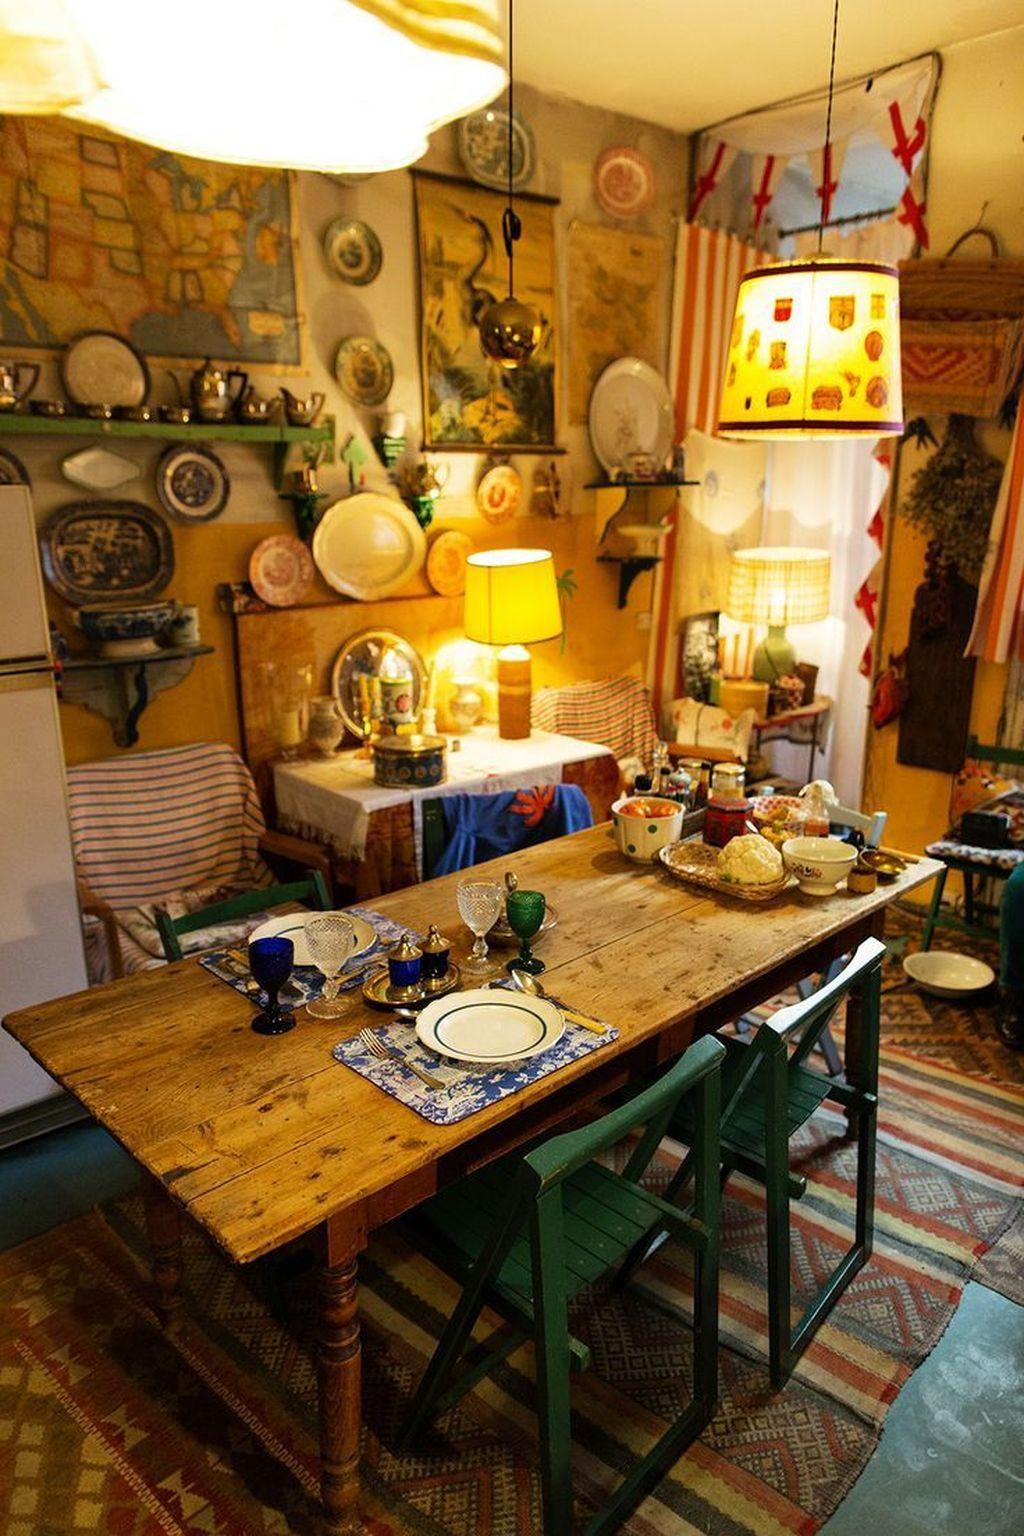 bohemian style kitchen image by sally mirick on kitchen bohemian kitchen bohemian style on boho chic kitchen decor bohemian interior id=53479